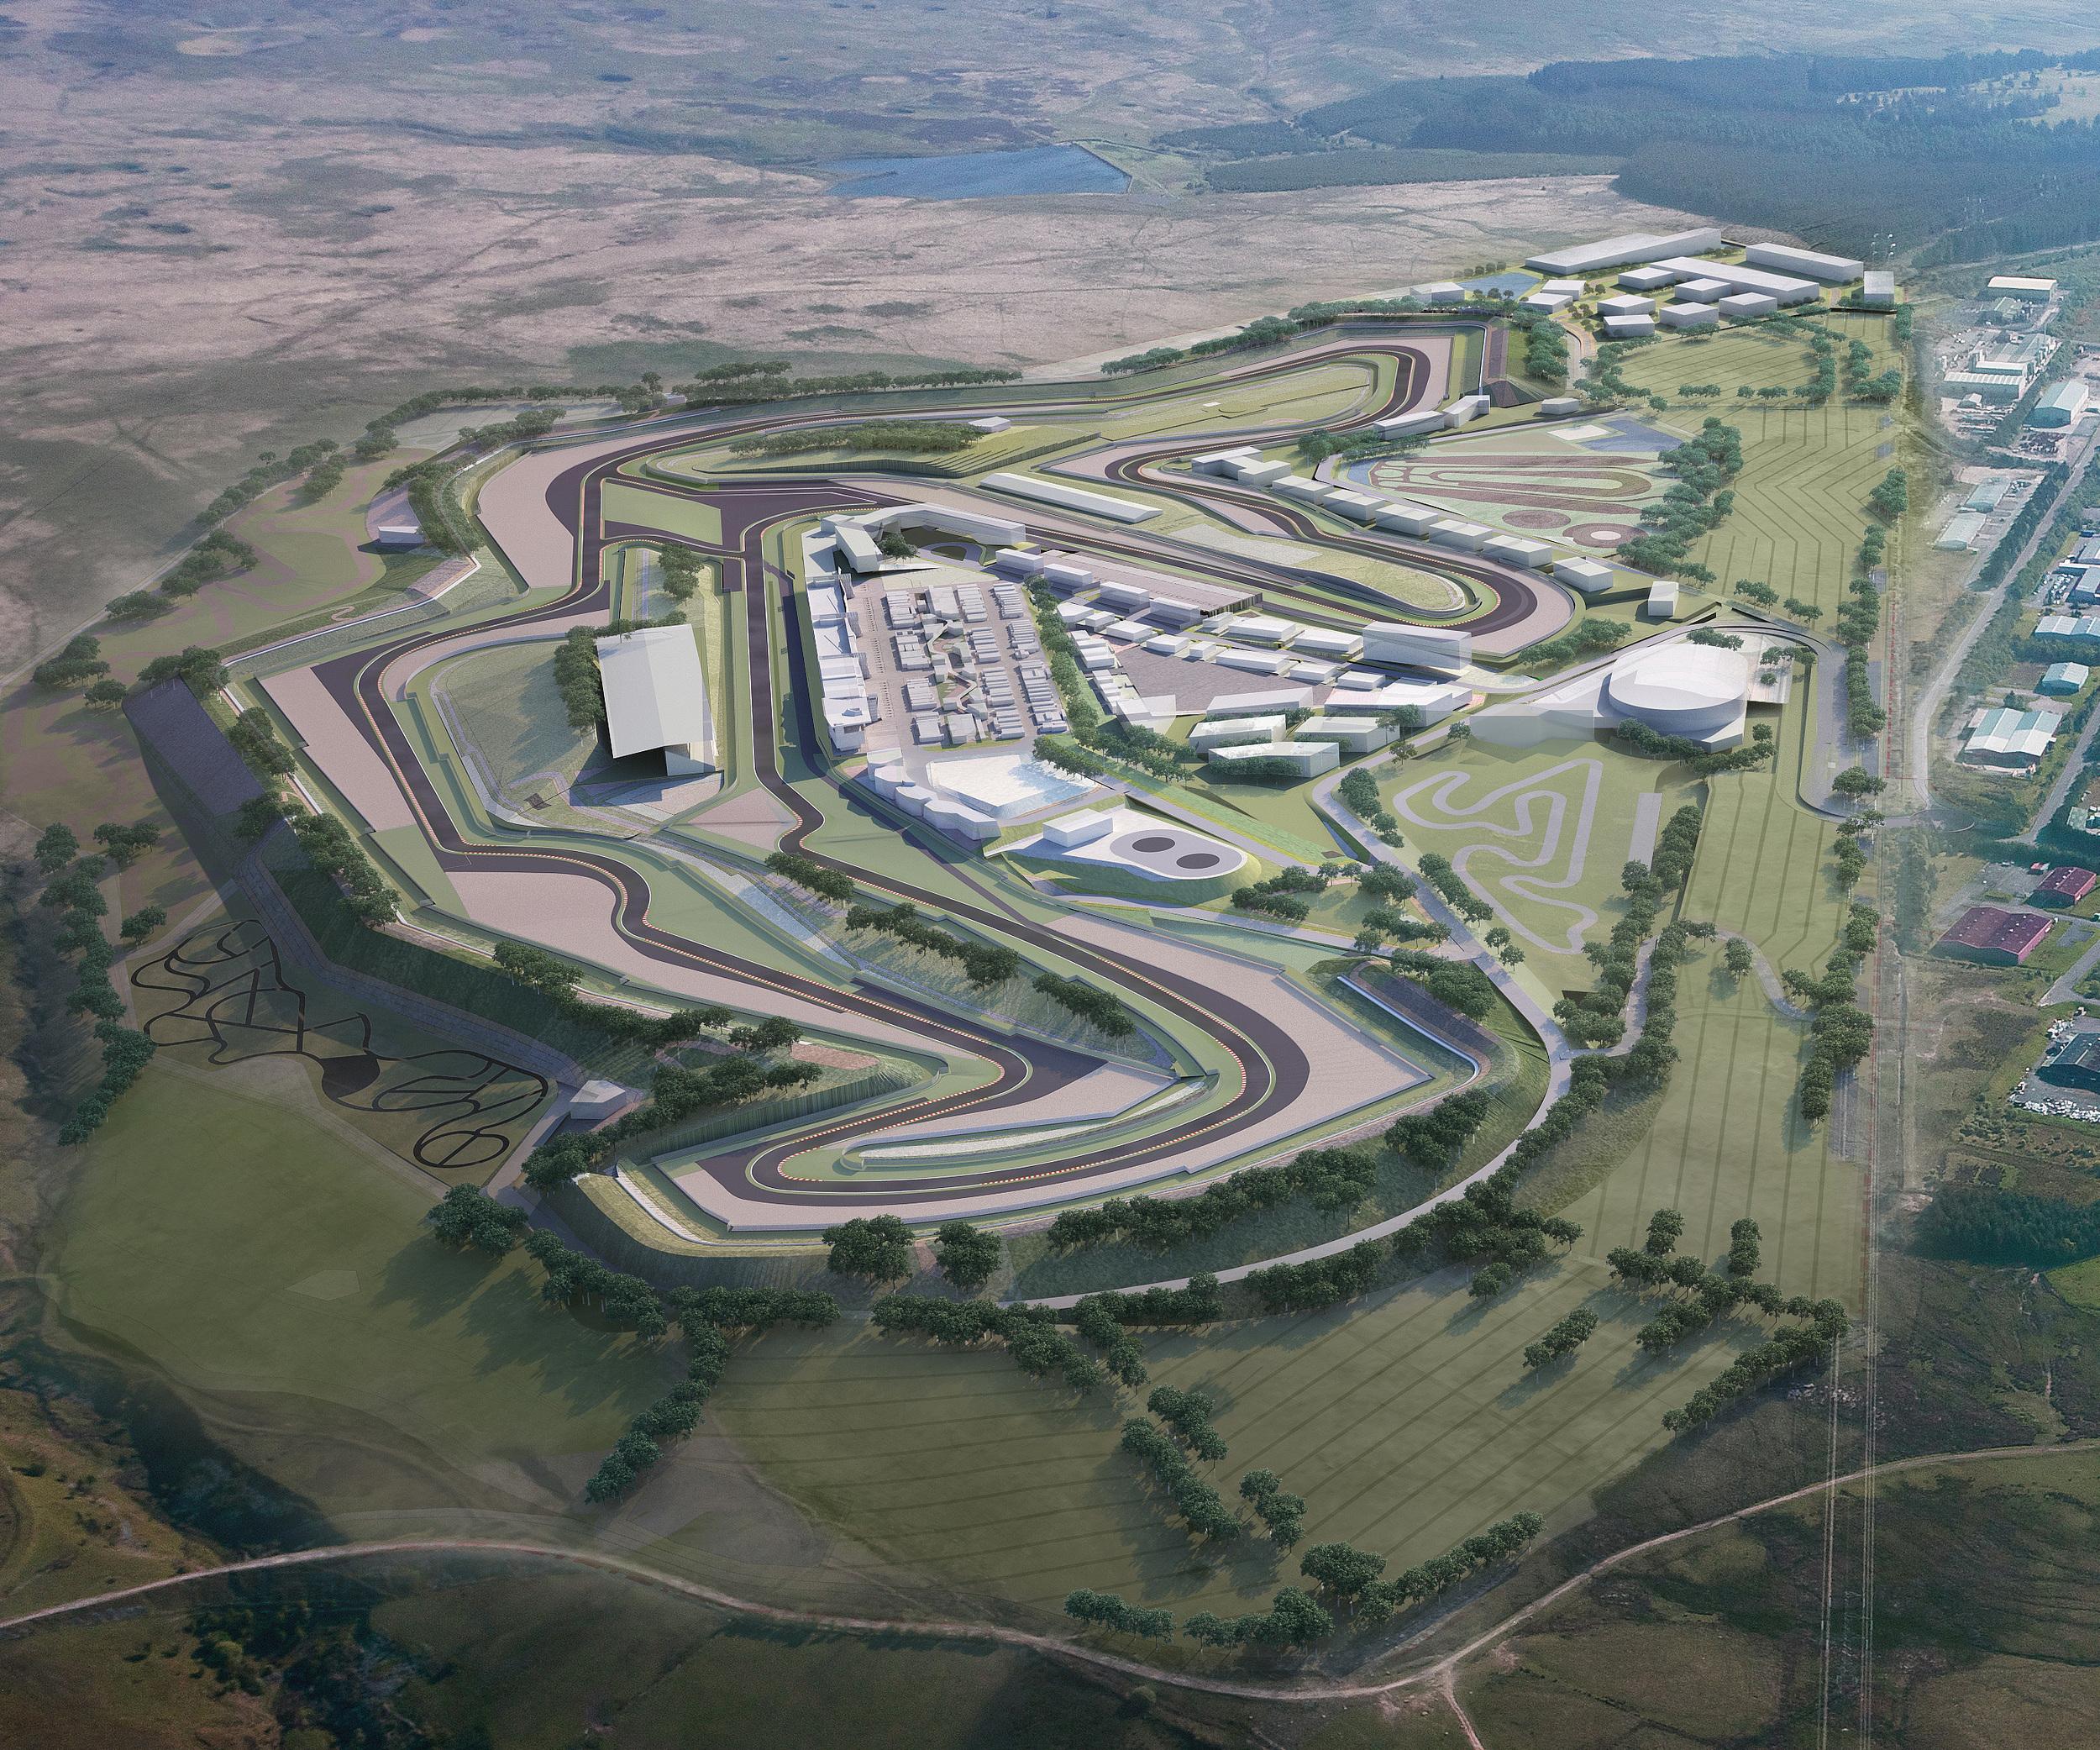 2013-08-08 - Circuit of Wales - aerial023 - preview big.jpg